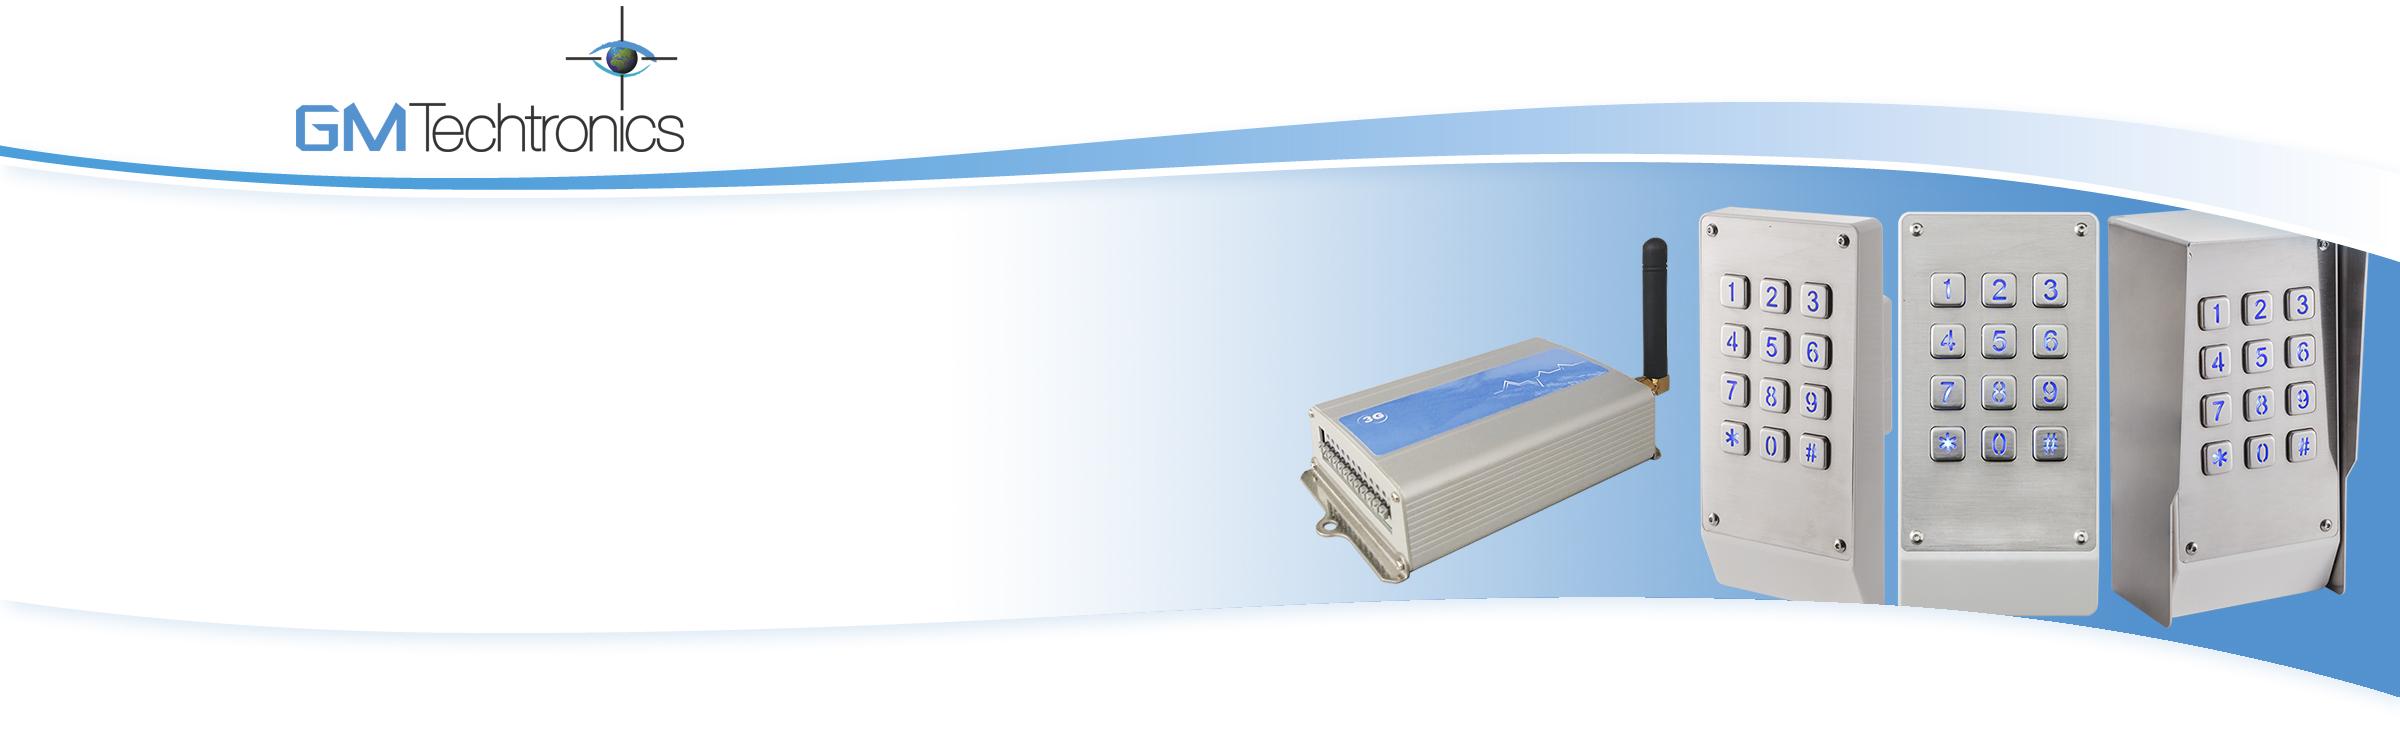 GM-Tech-slide-3G-Switch